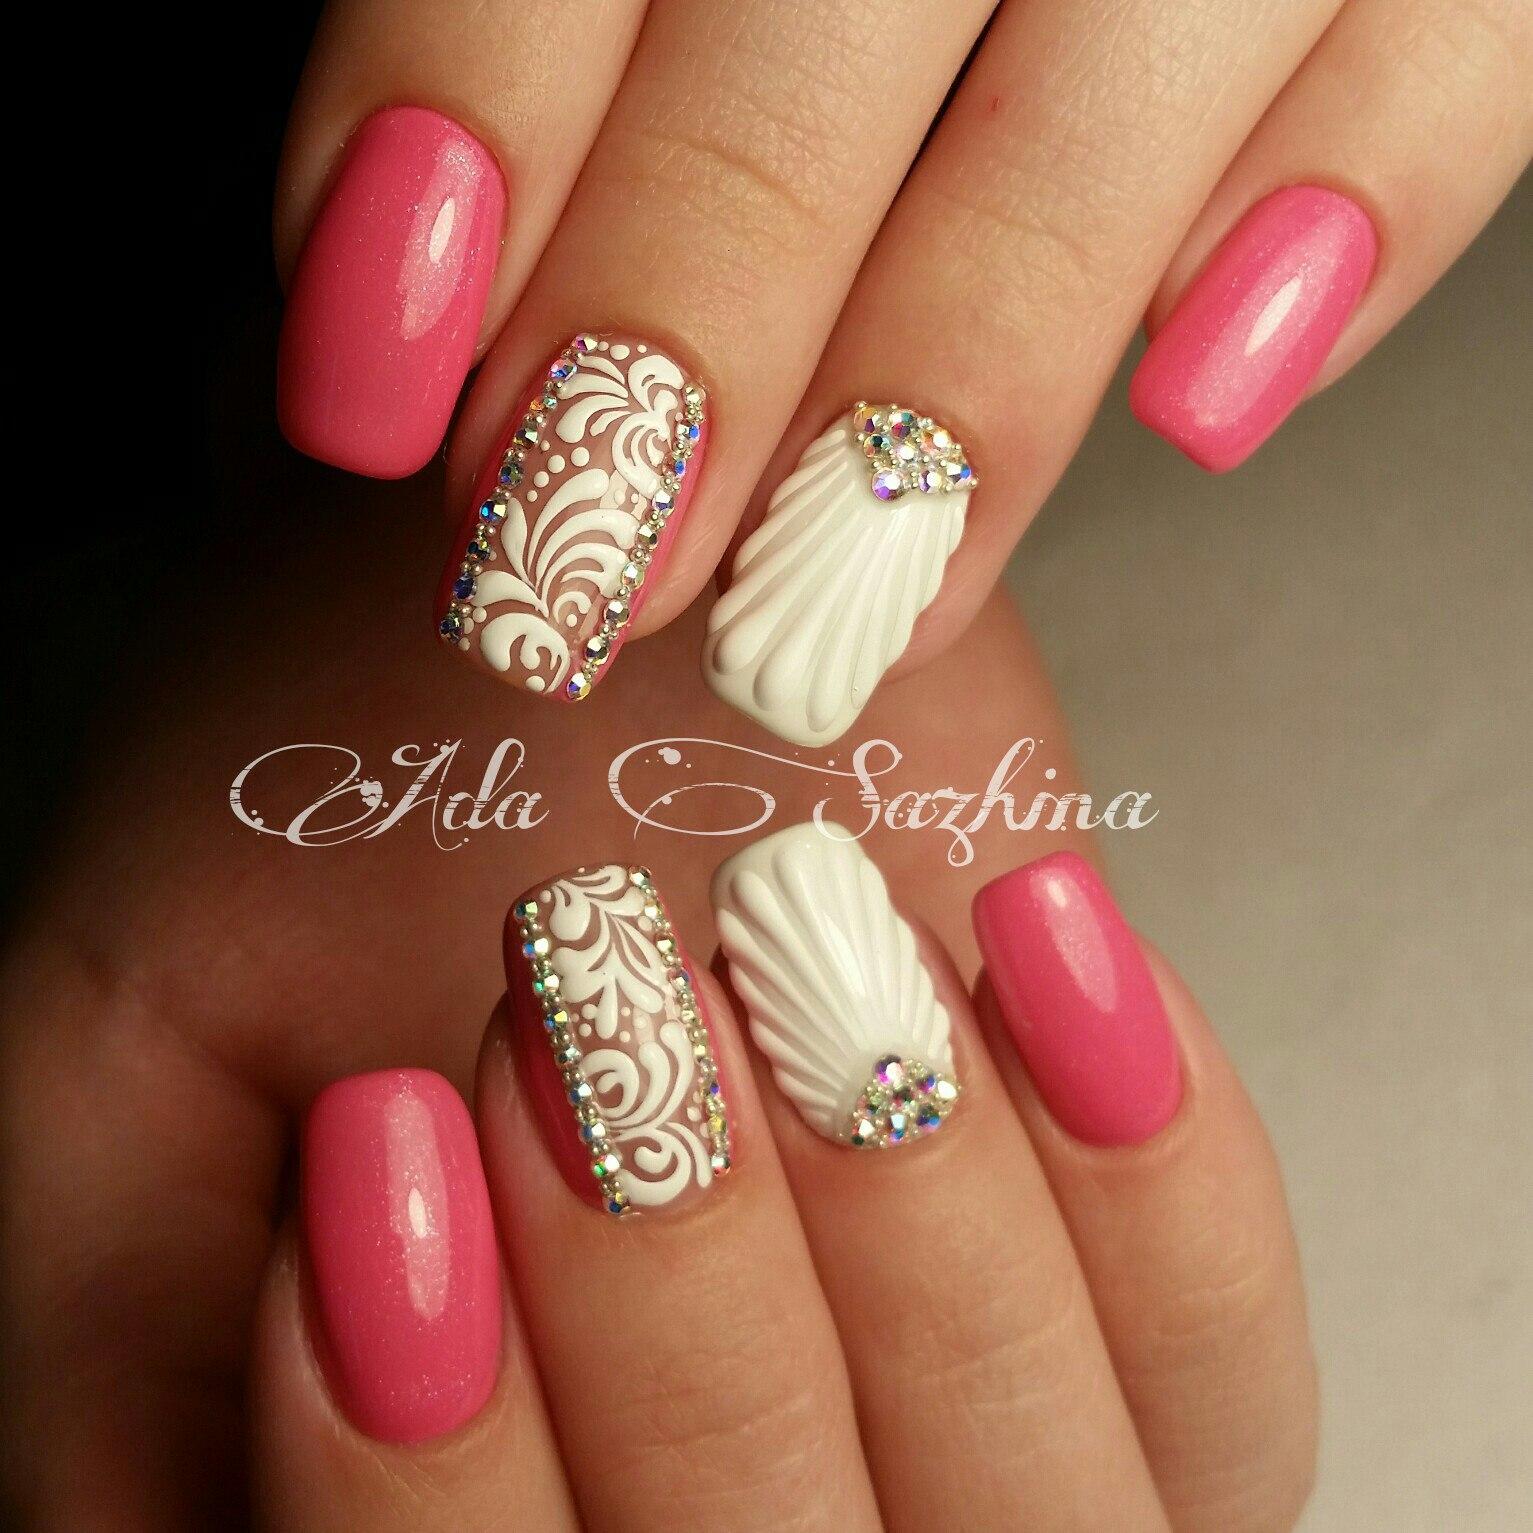 Дизайн «Ракушки» на ногтях гель-лаком